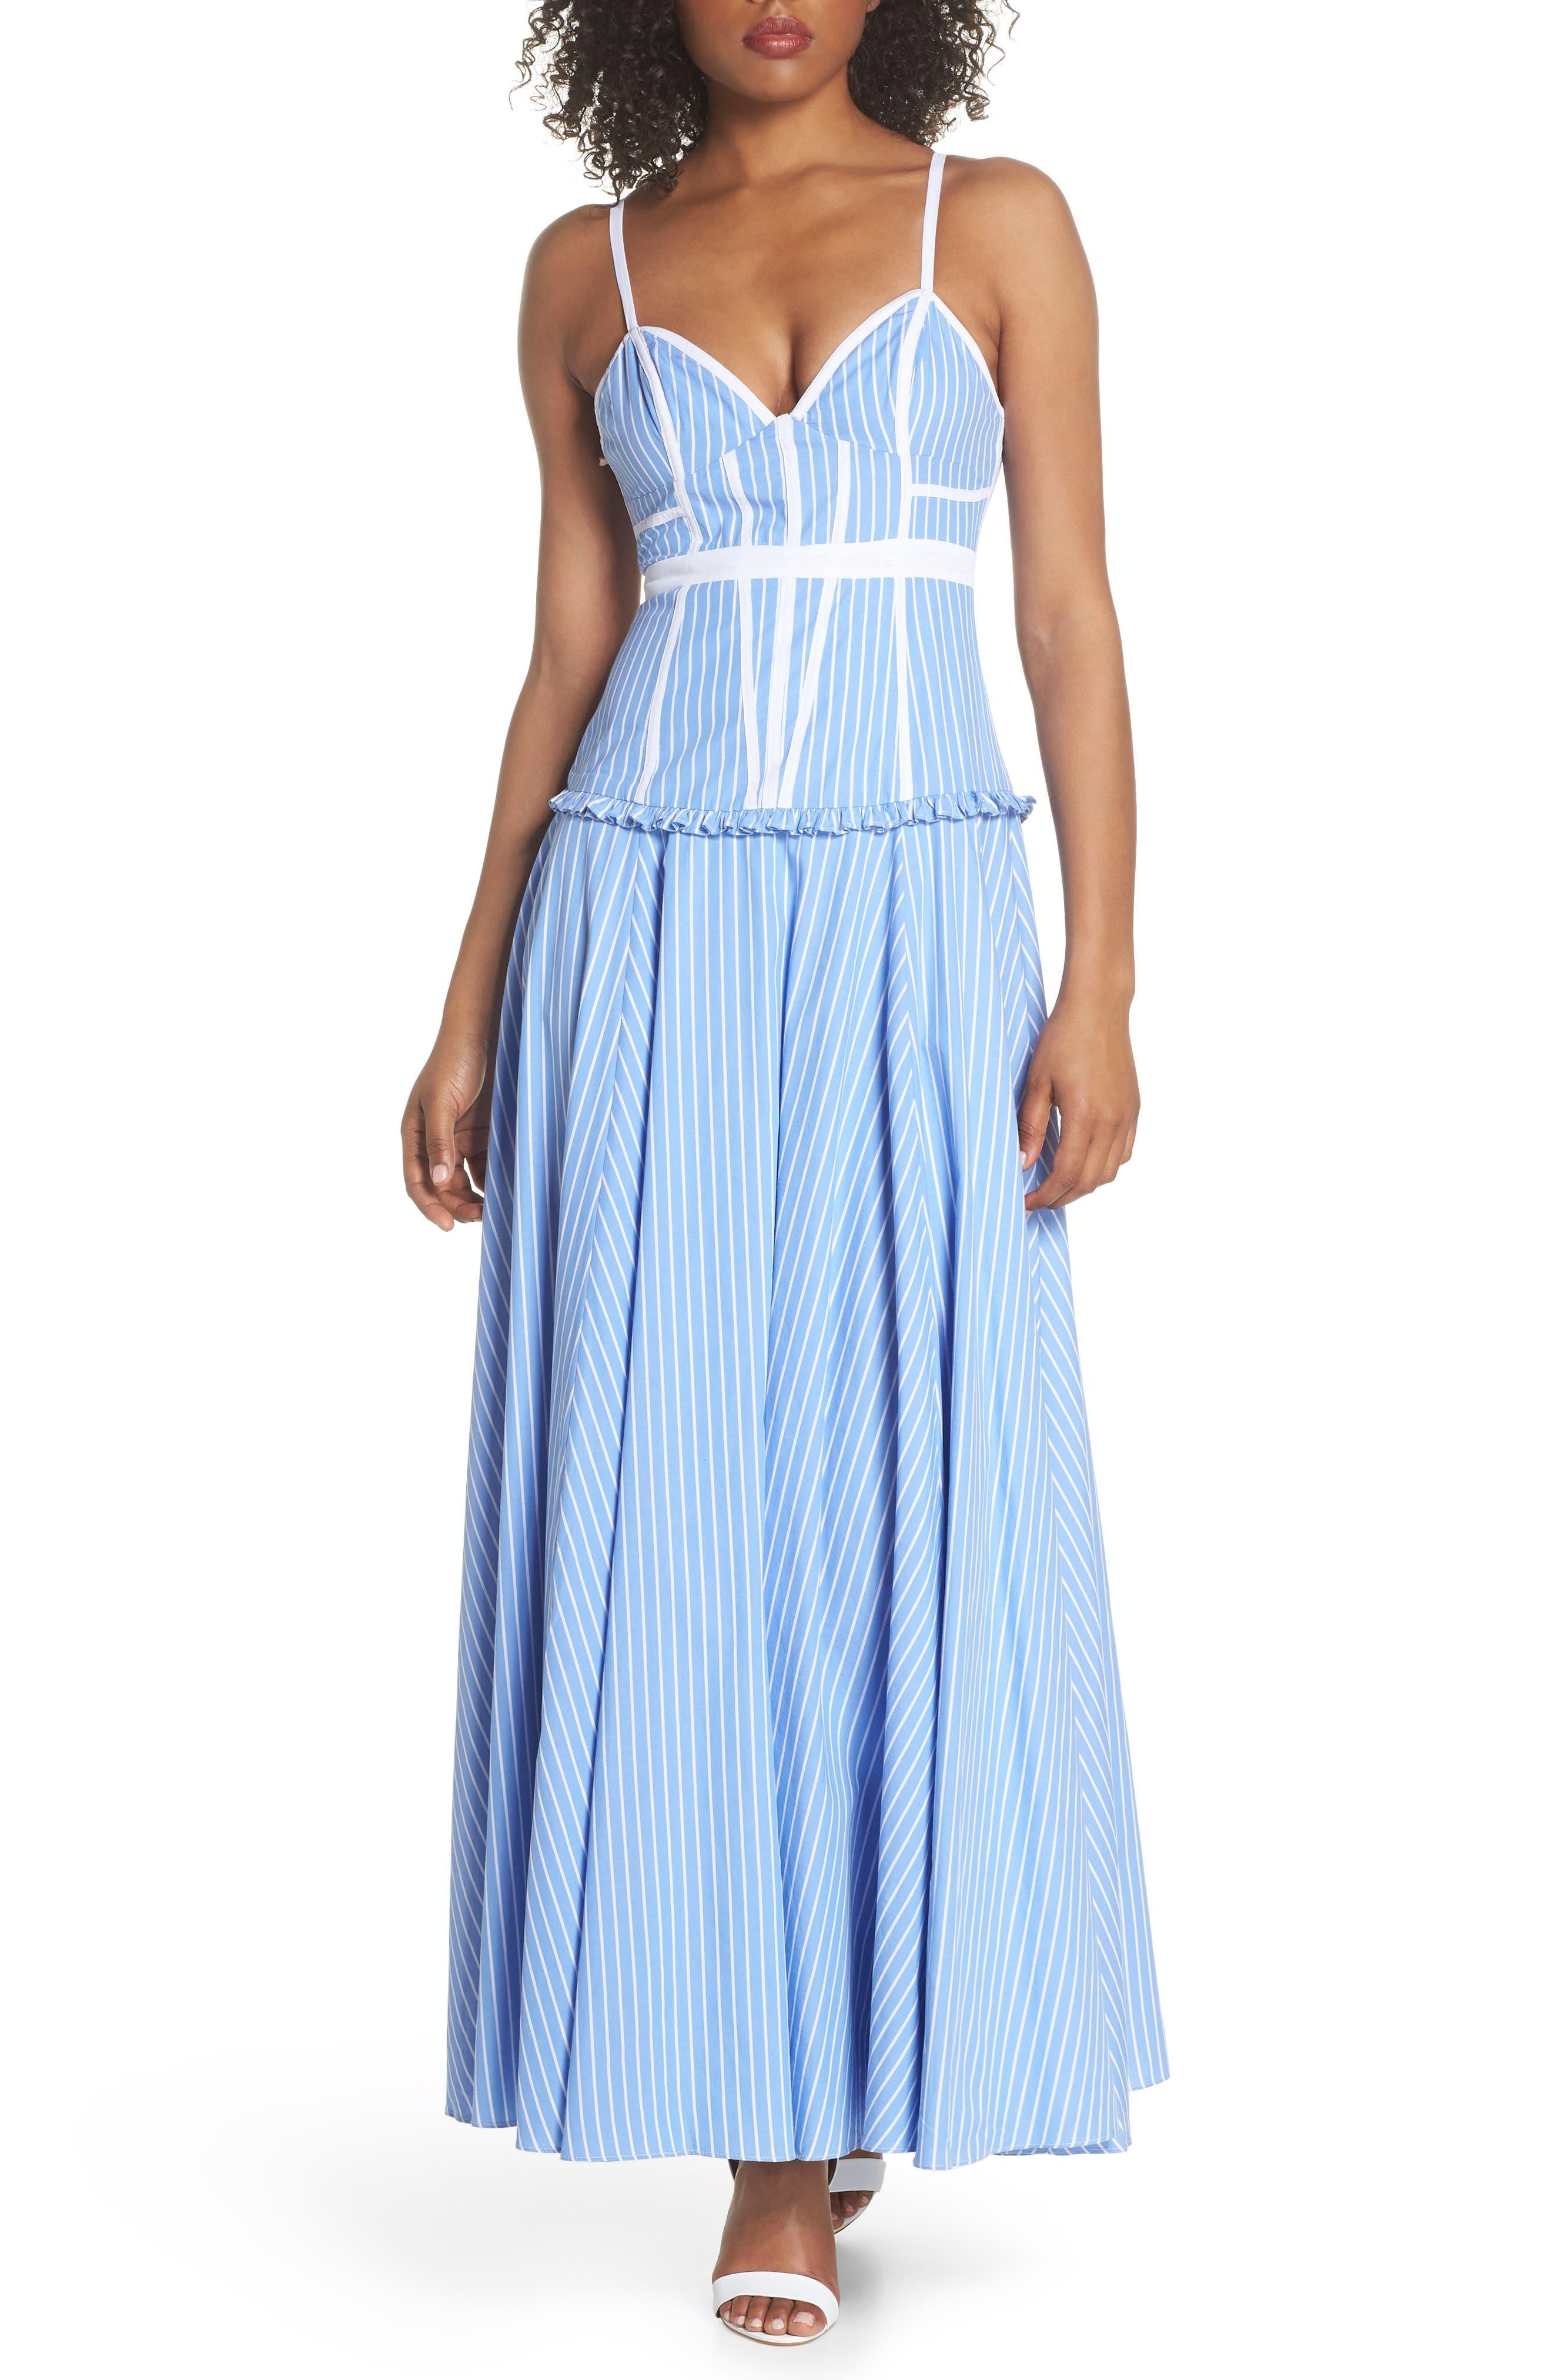 Morrow Stripe Corset Gown,                         Main,                         color, Pale Blue/ White Stripe